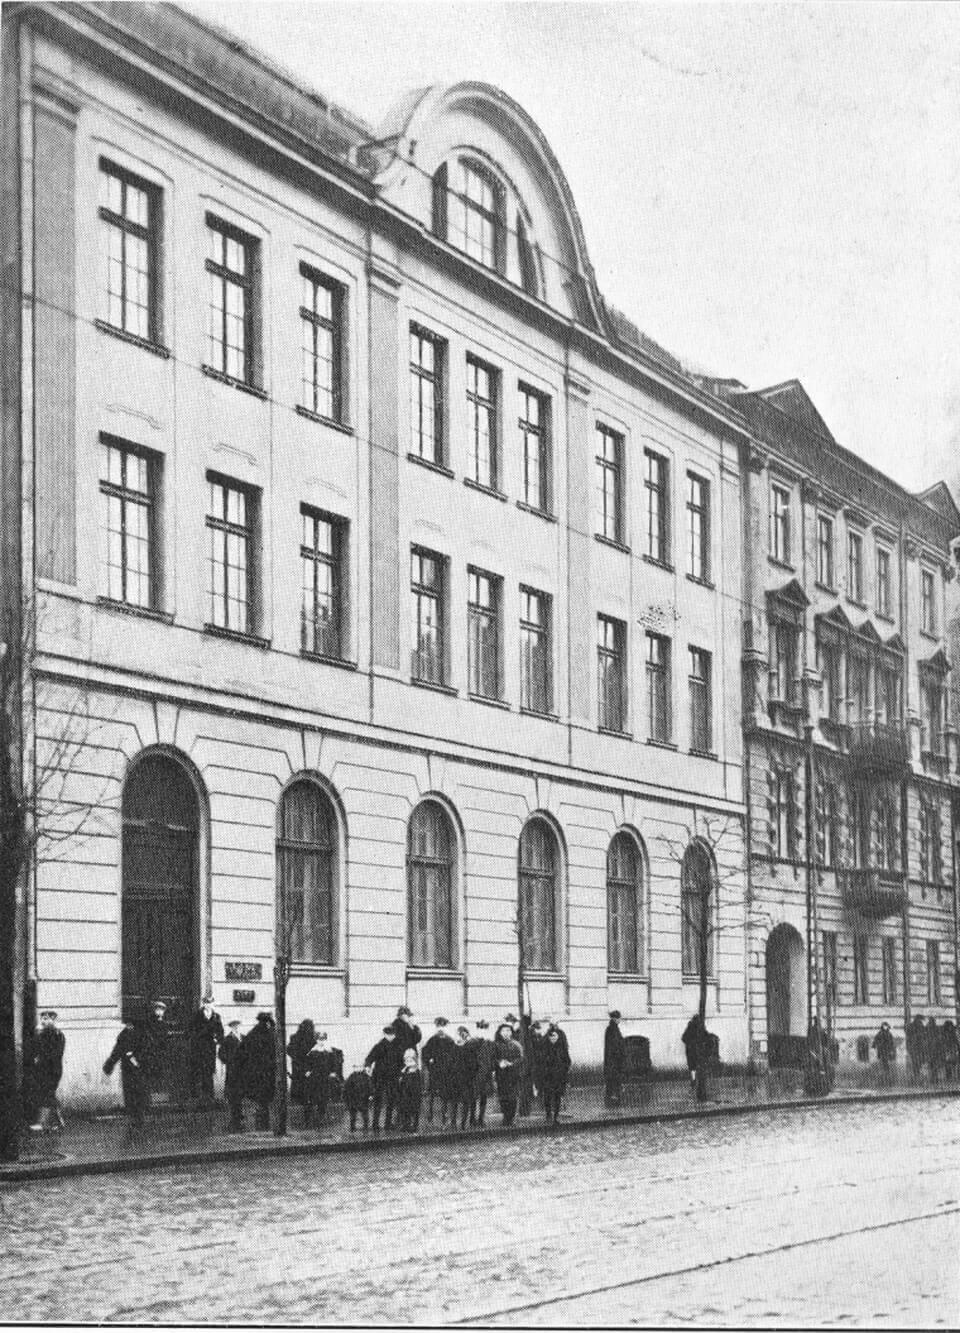 AN EXPULSION: CHLODNA 33 in Warsaw